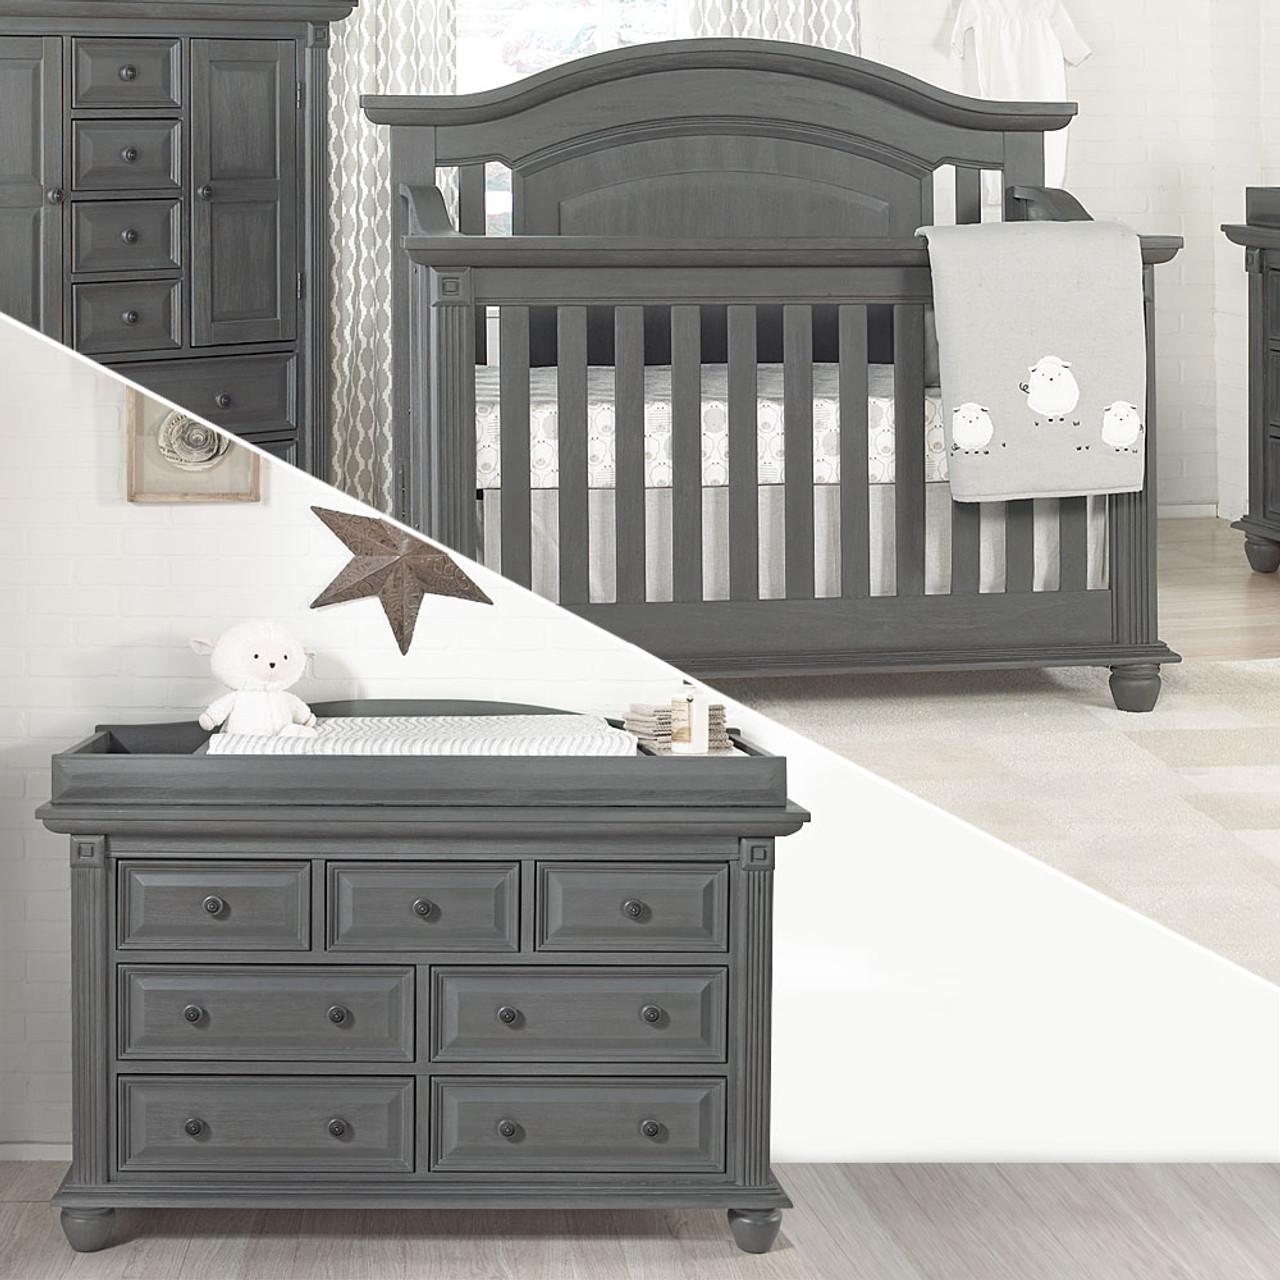 oxford baby london lane 2 piece nursery set crib dresser in arctic gray